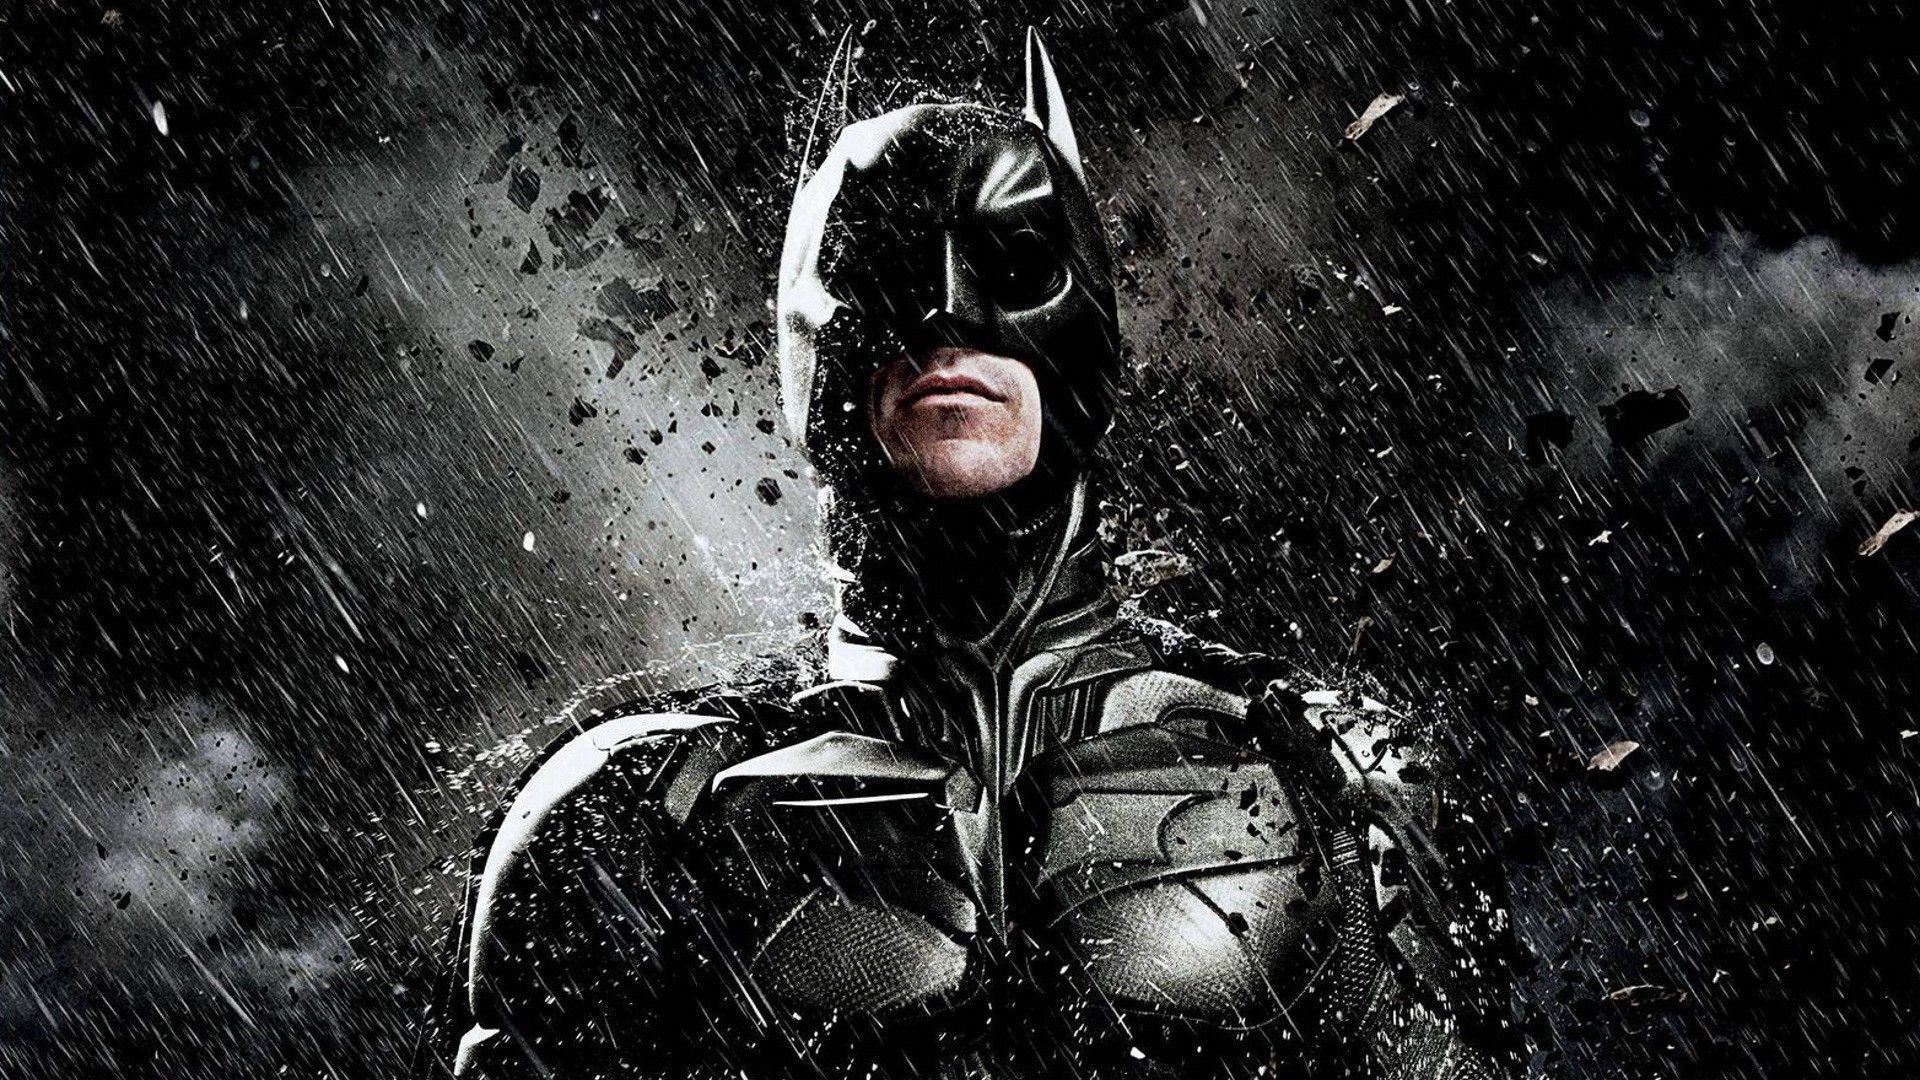 Christian Bale Batman Wallpapers - Top Free Christian Bale Batman Backgrounds - WallpaperAccess